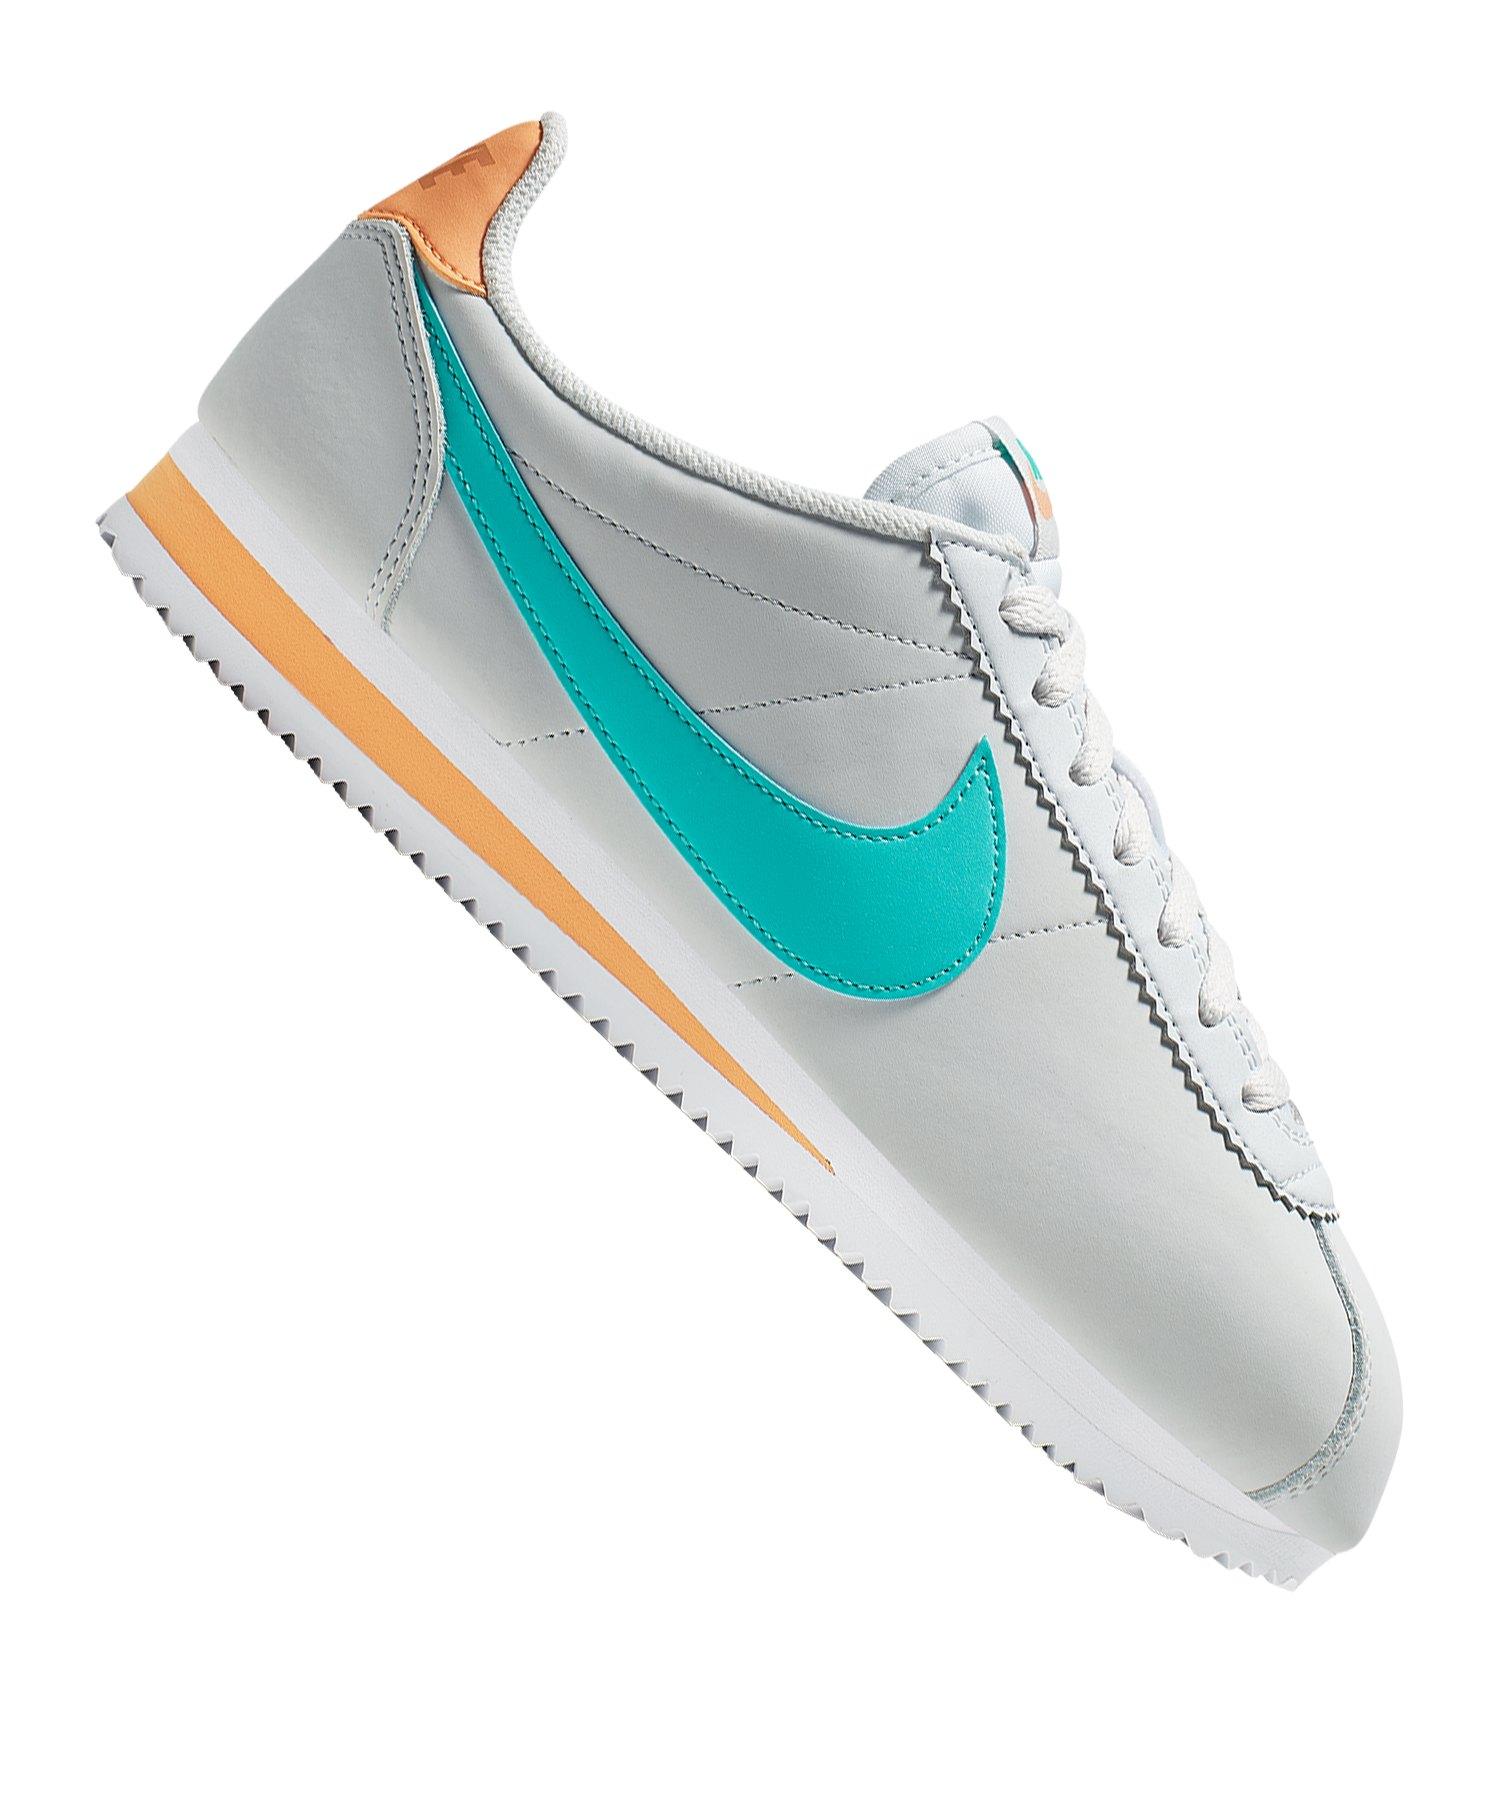 sports shoes ebd1a 6e391 Nike Classic Cortez Leder Sneaker Damen F019